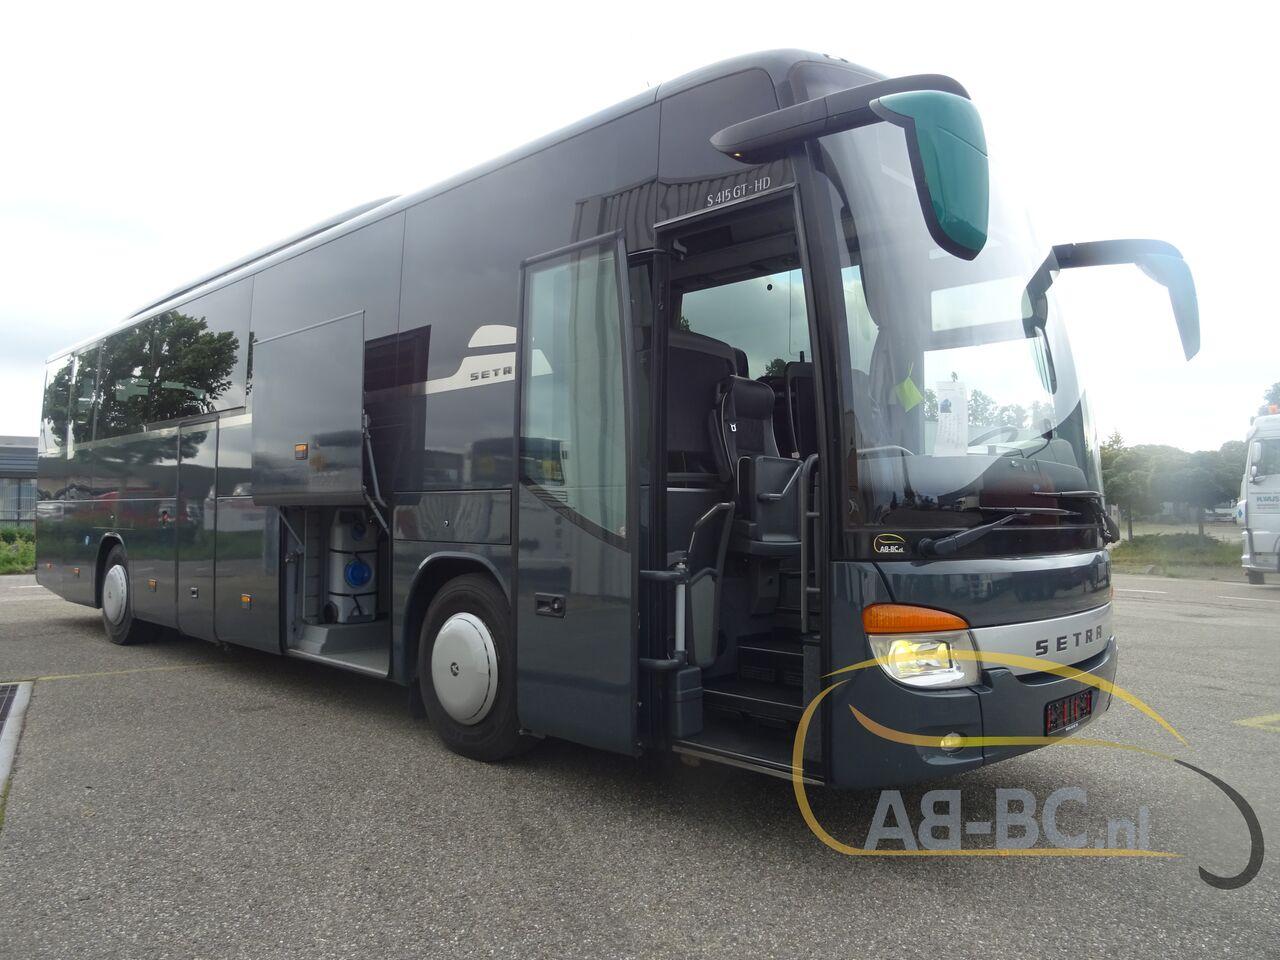 coach-busSETRA-S415-GT-HD-FINAL-EDITION---1627456887655888945_big_65468909abba51359c849f542b038bba--21050713010665719300